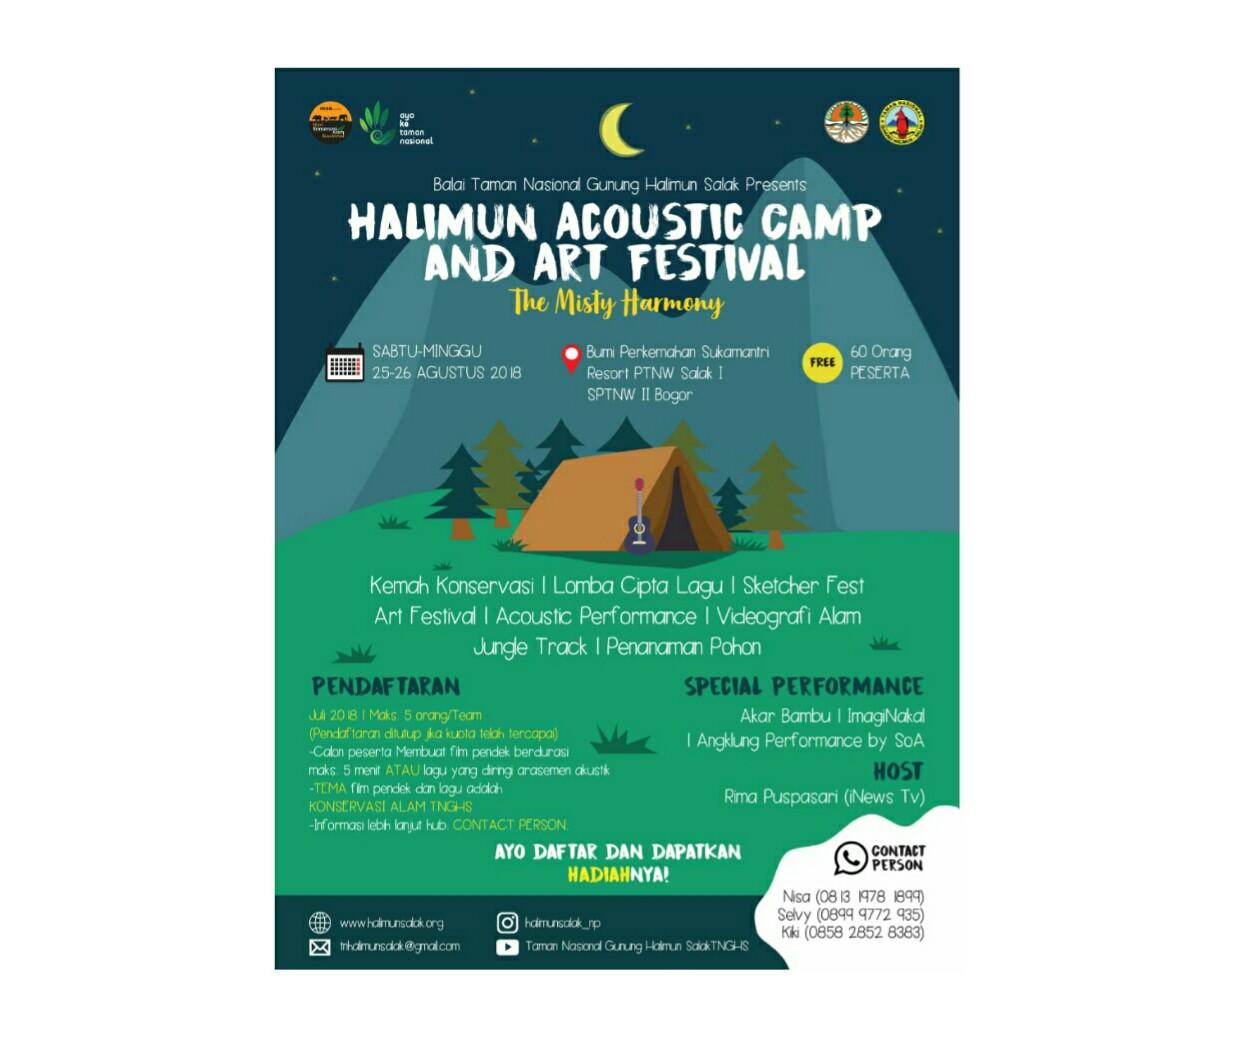 Pengen camping plus akomodasi gratis di Sukamantri?